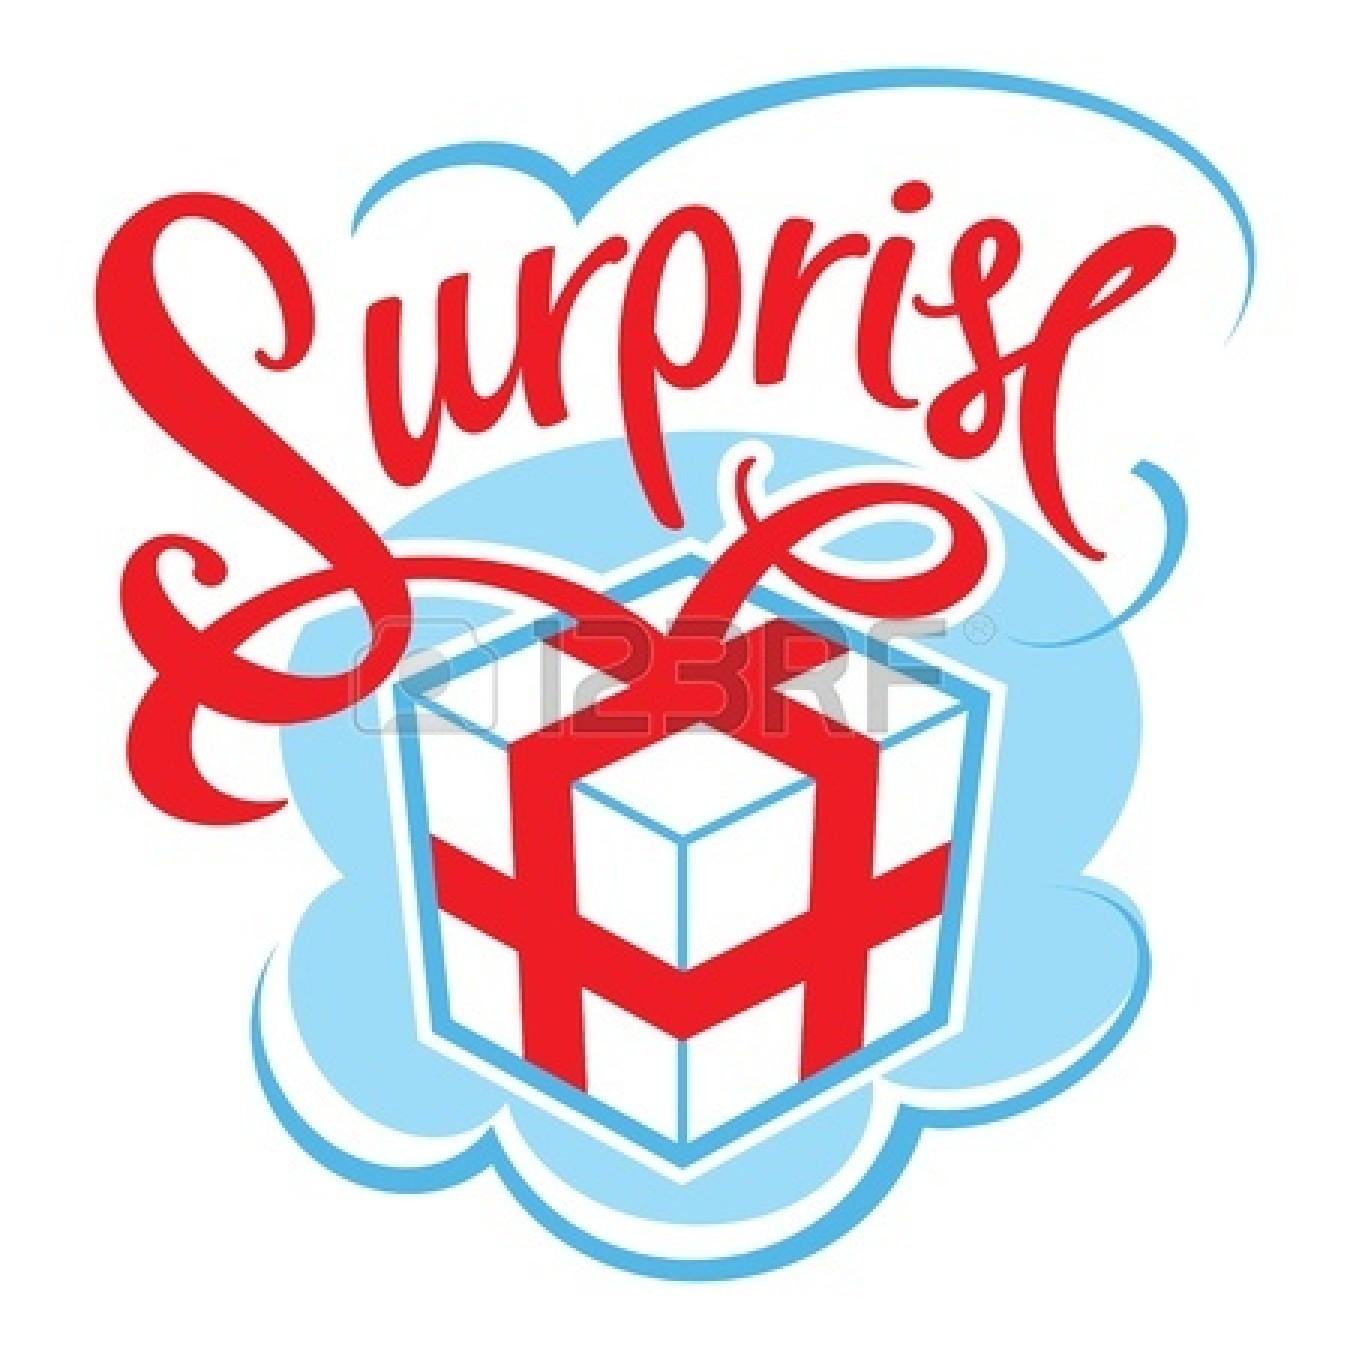 Surprise clipart free clipart Surprise Clip Art Free | Clipart Panda - Free Clipart Images clipart